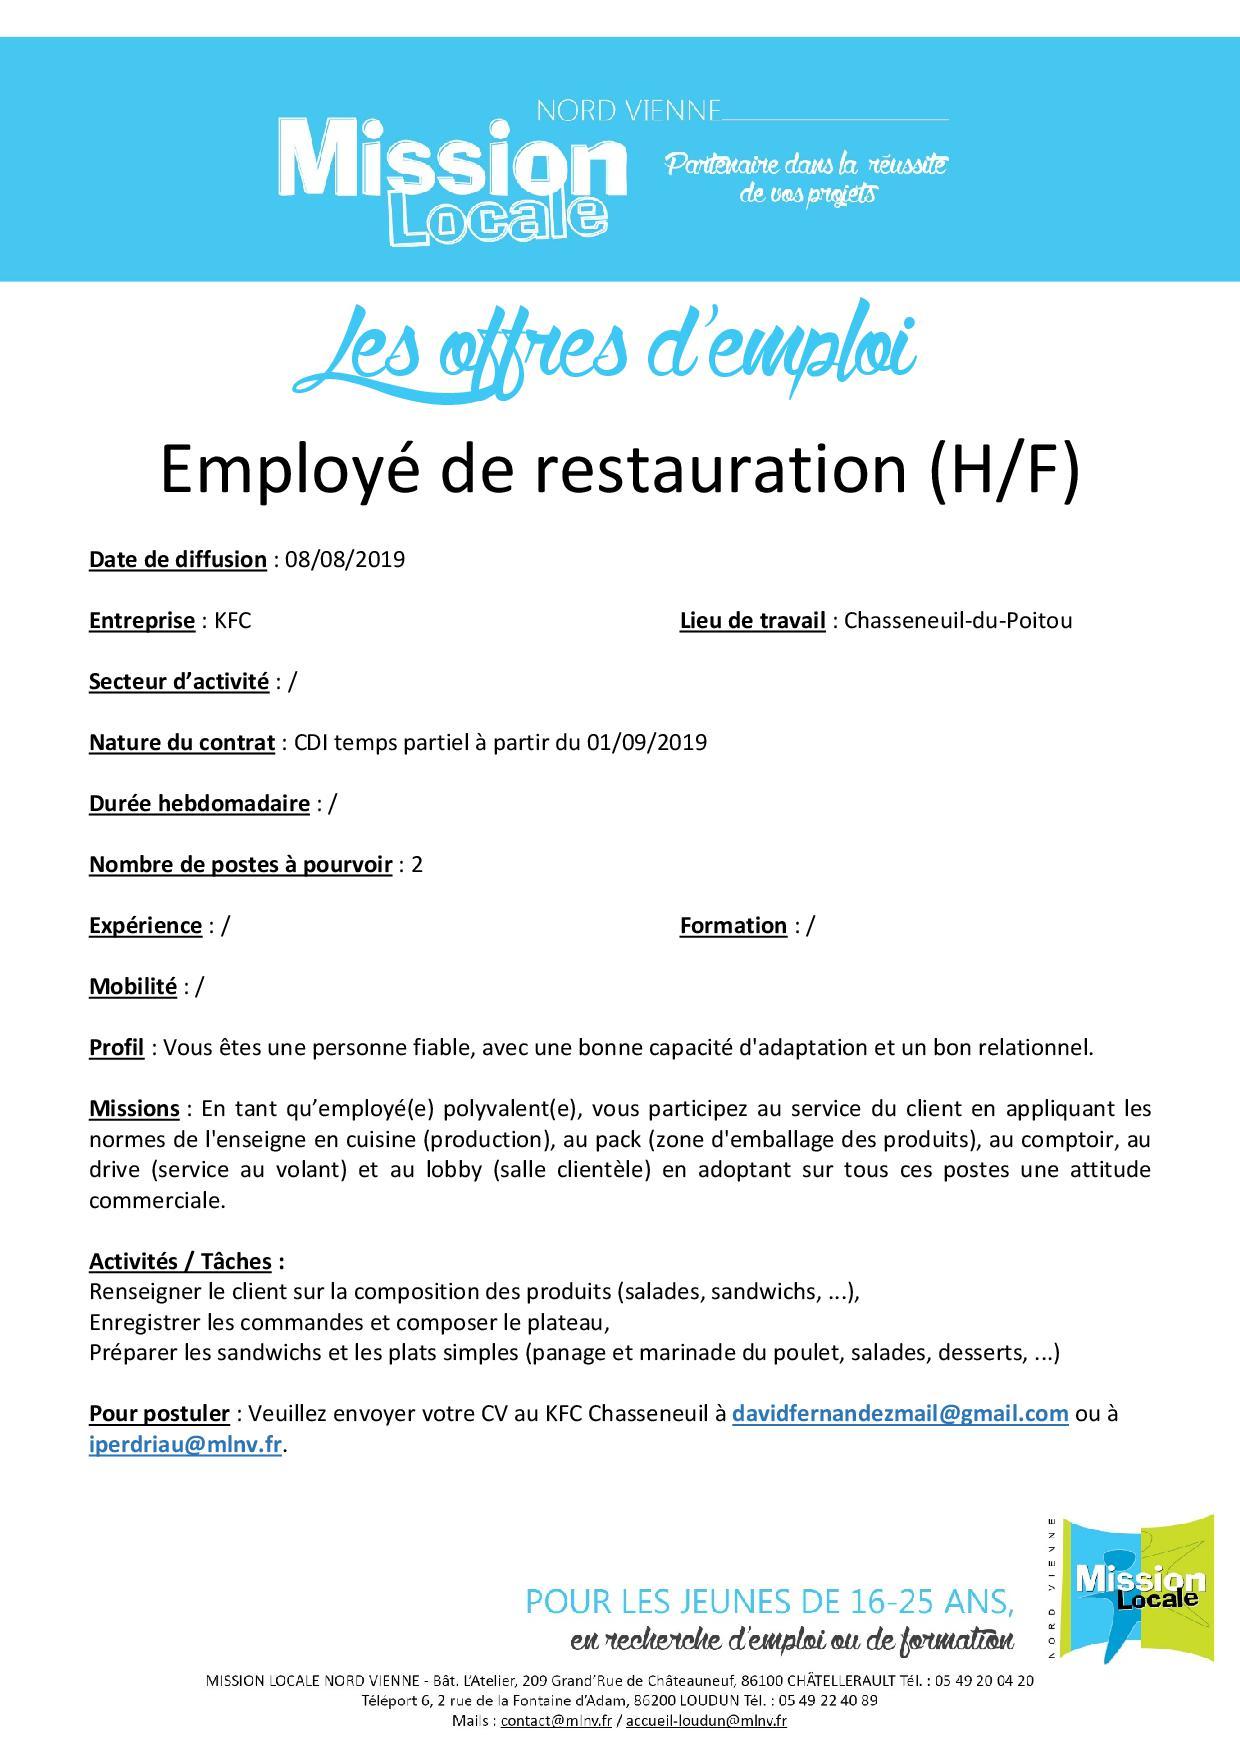 Employé de restauration (H/F)